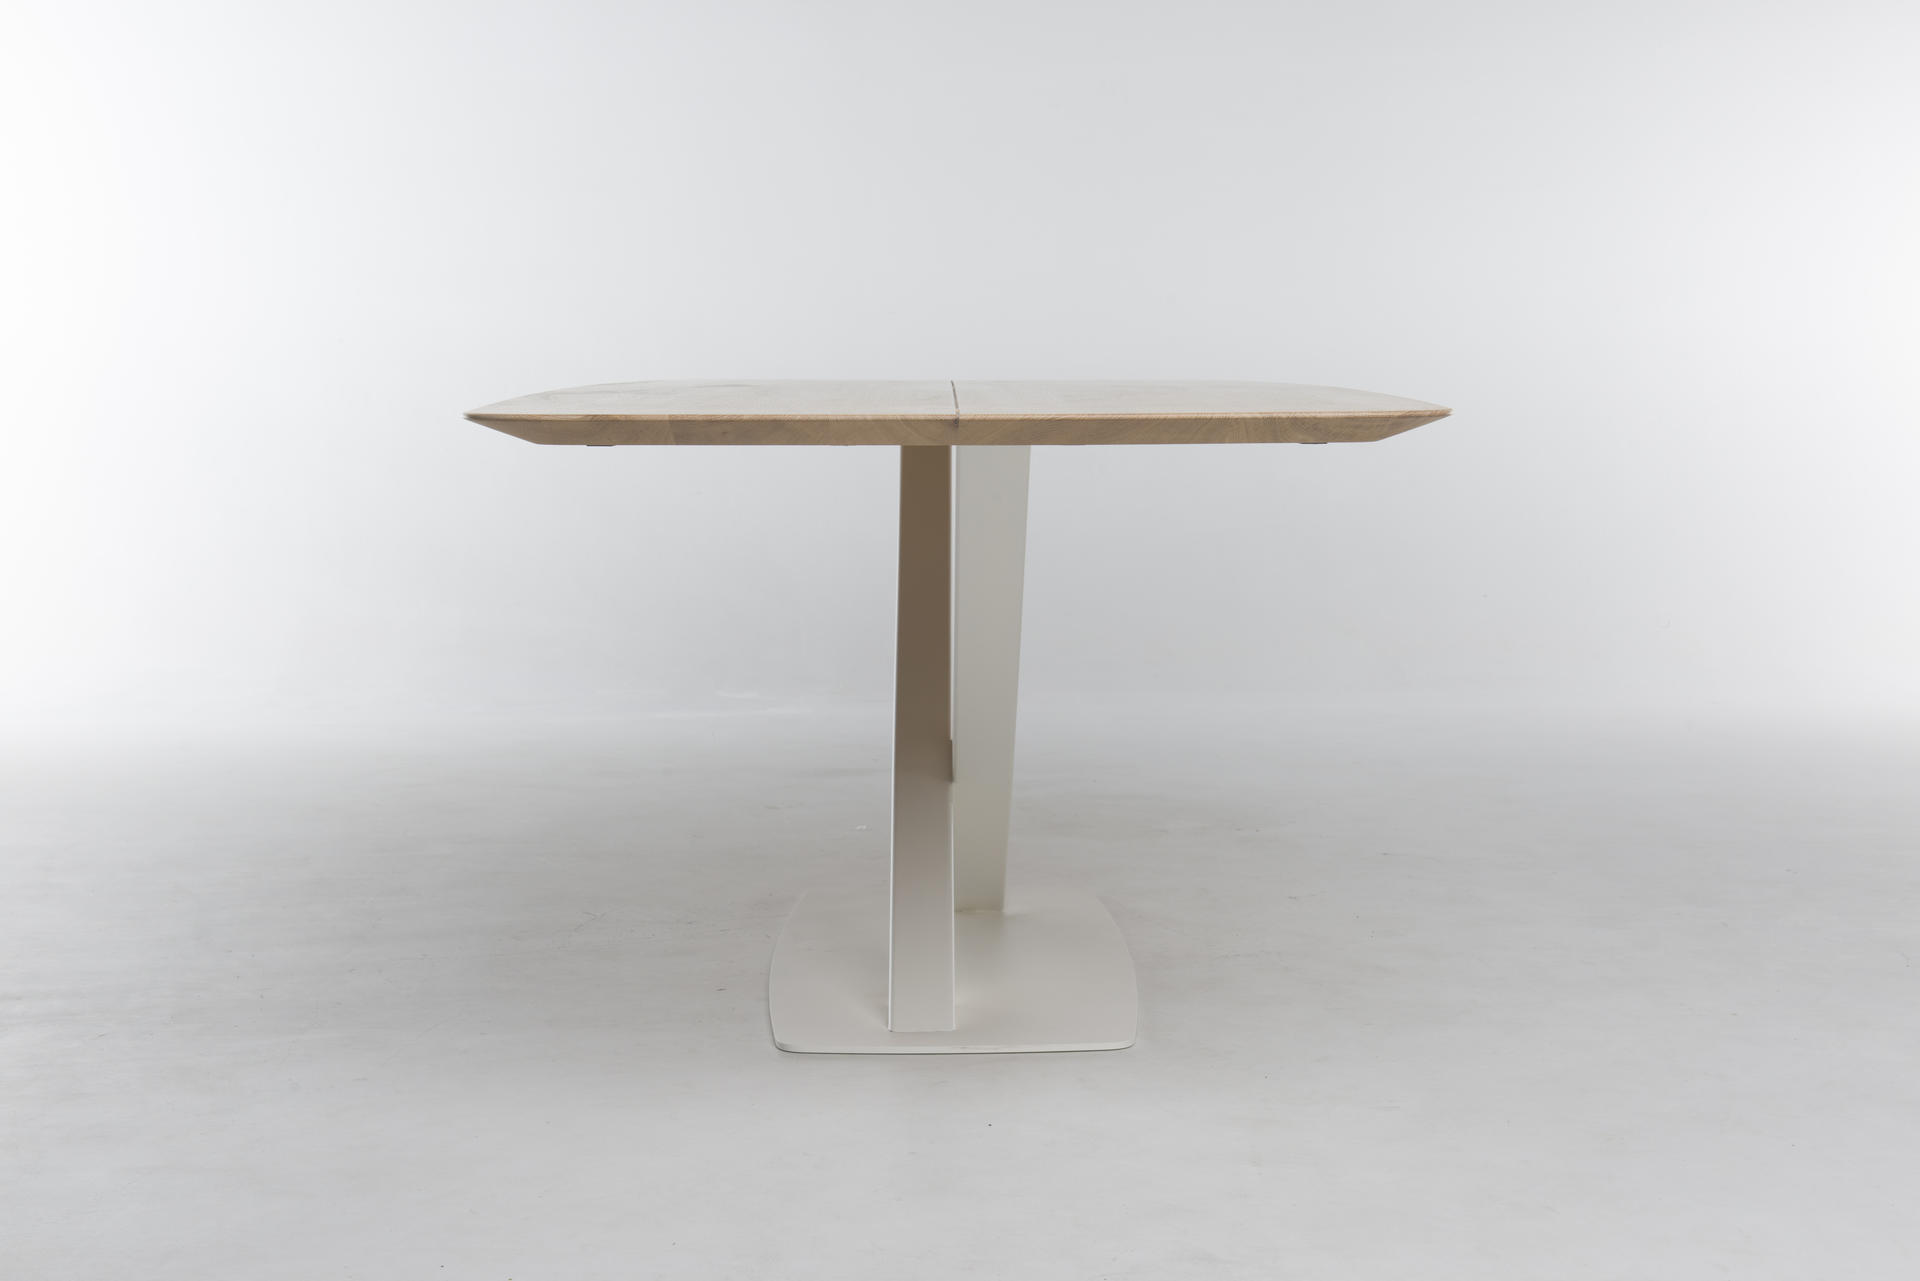 Стол OXXI, Bert Plantagie, фото 3